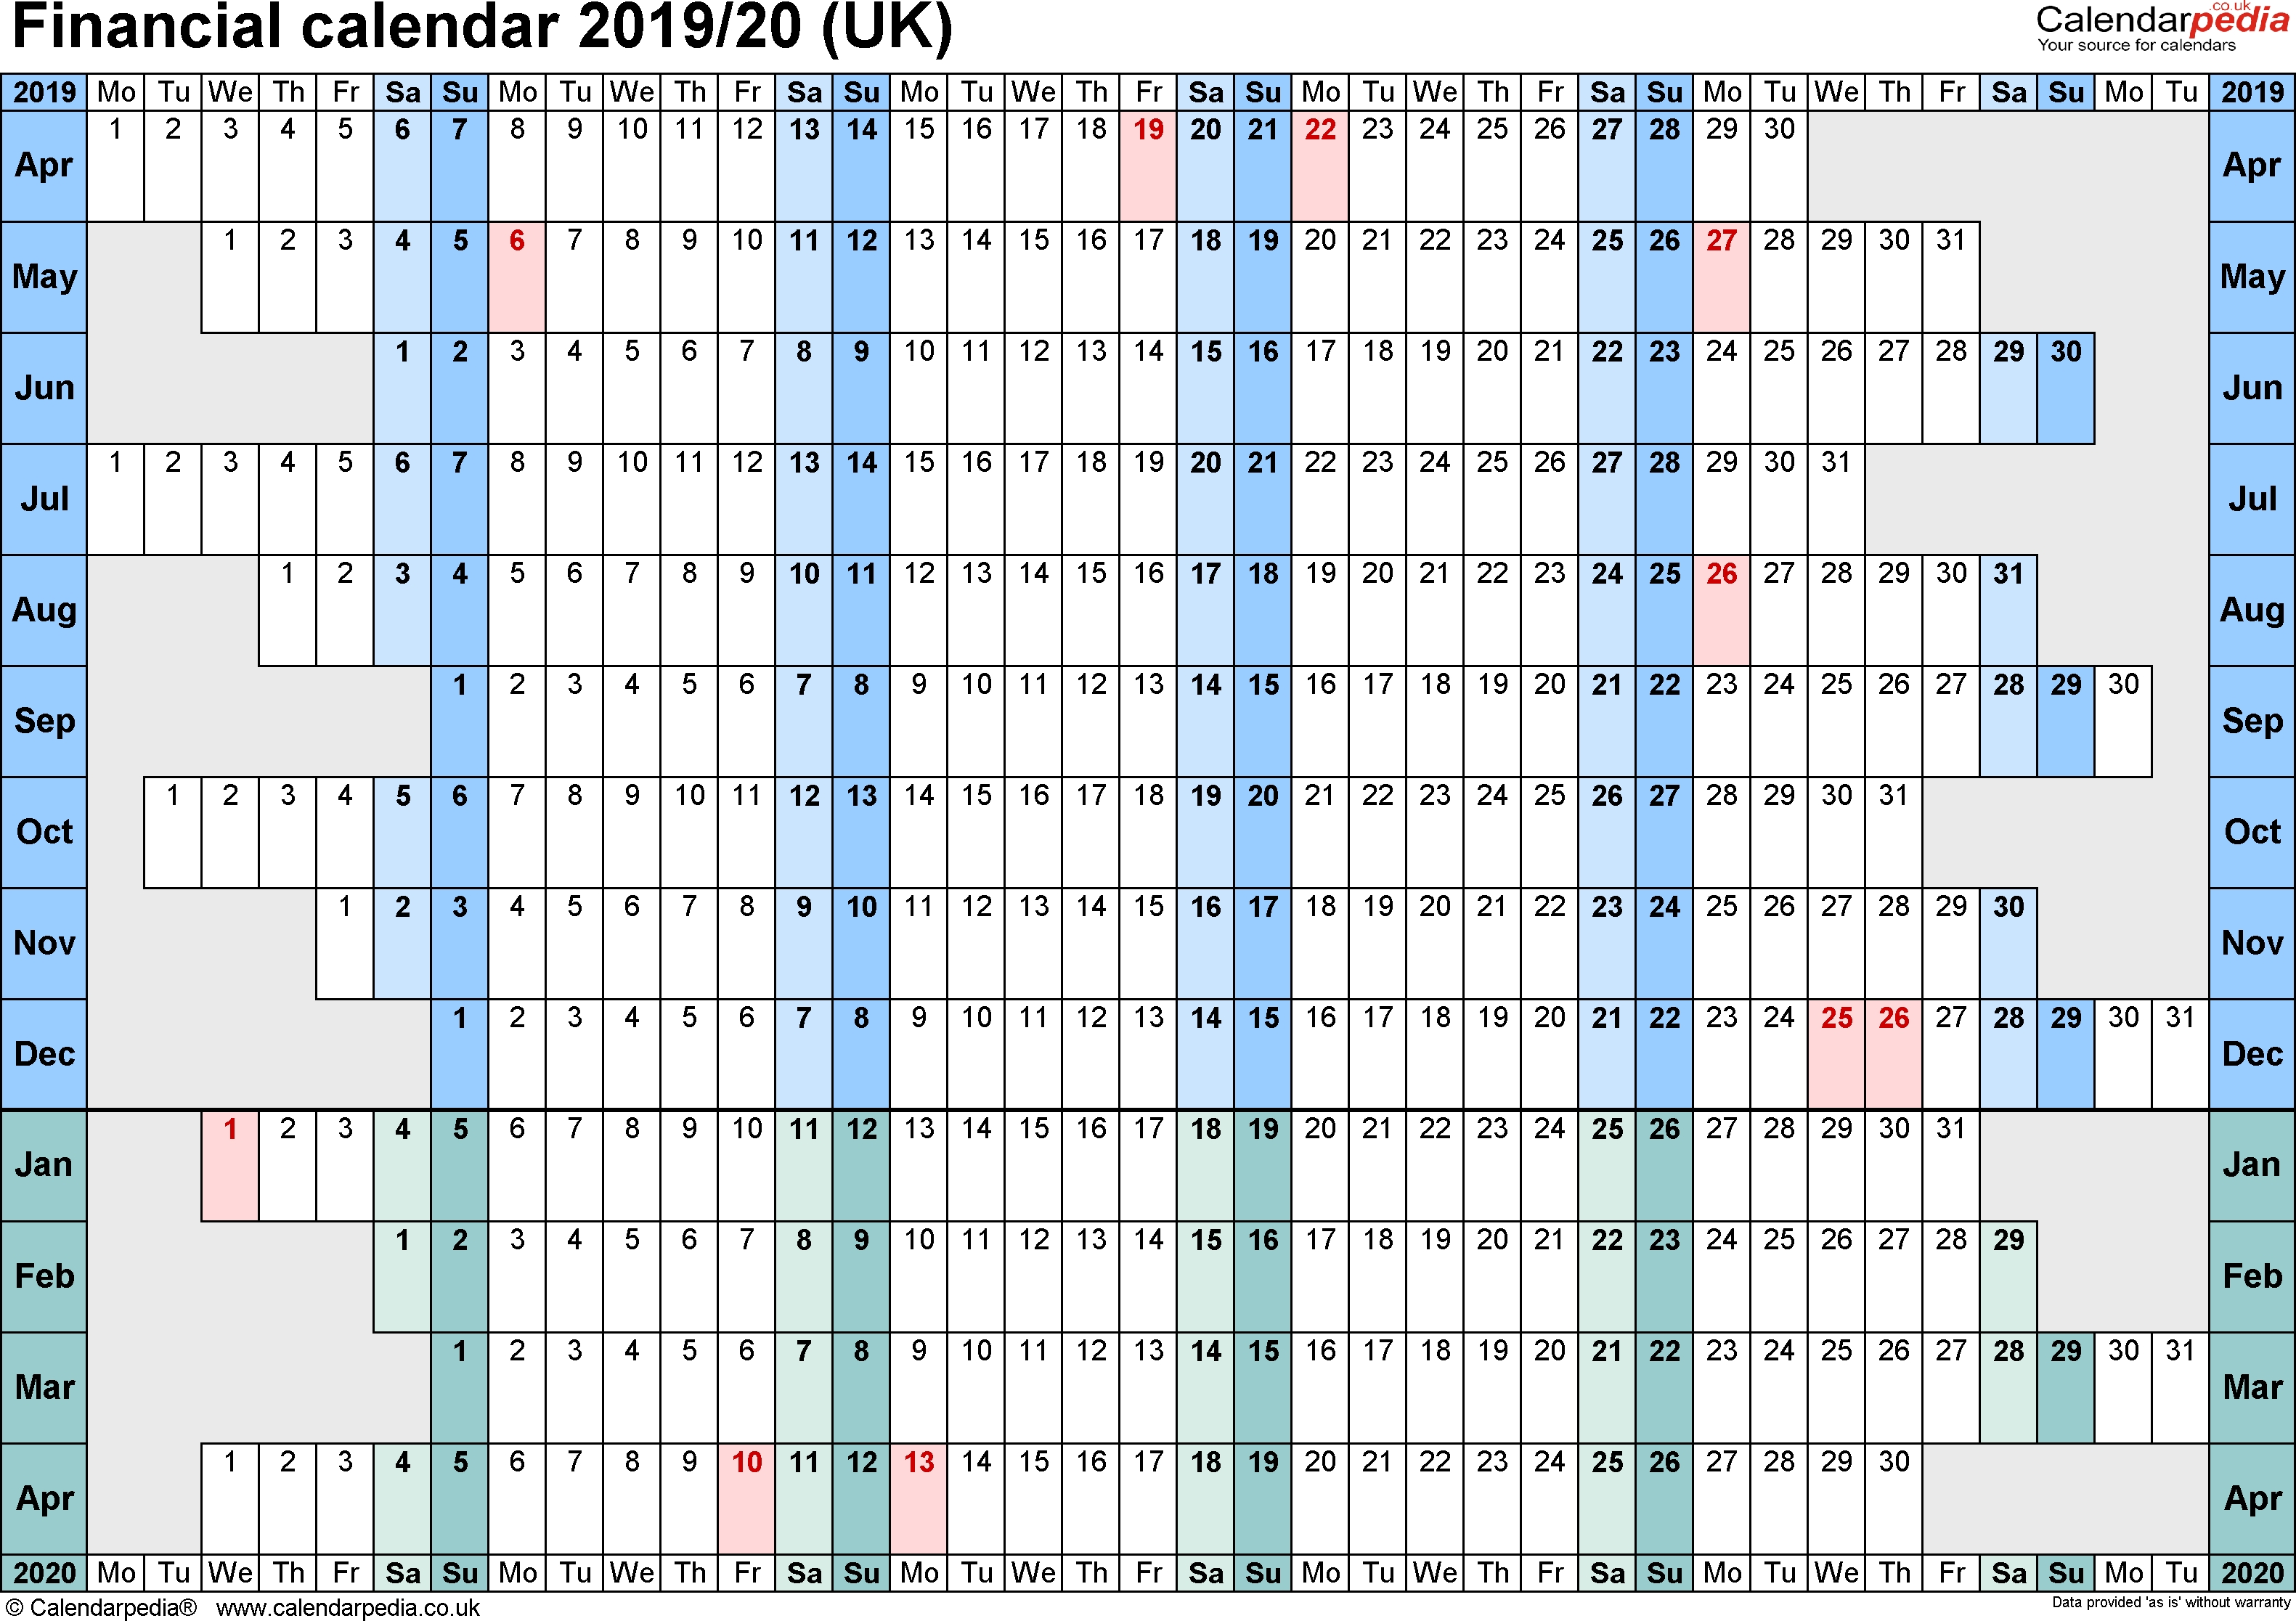 Financial Calendars 2019/20 (Uk) In Pdf Format regarding Hmrc Tax Calendar 2019/2020